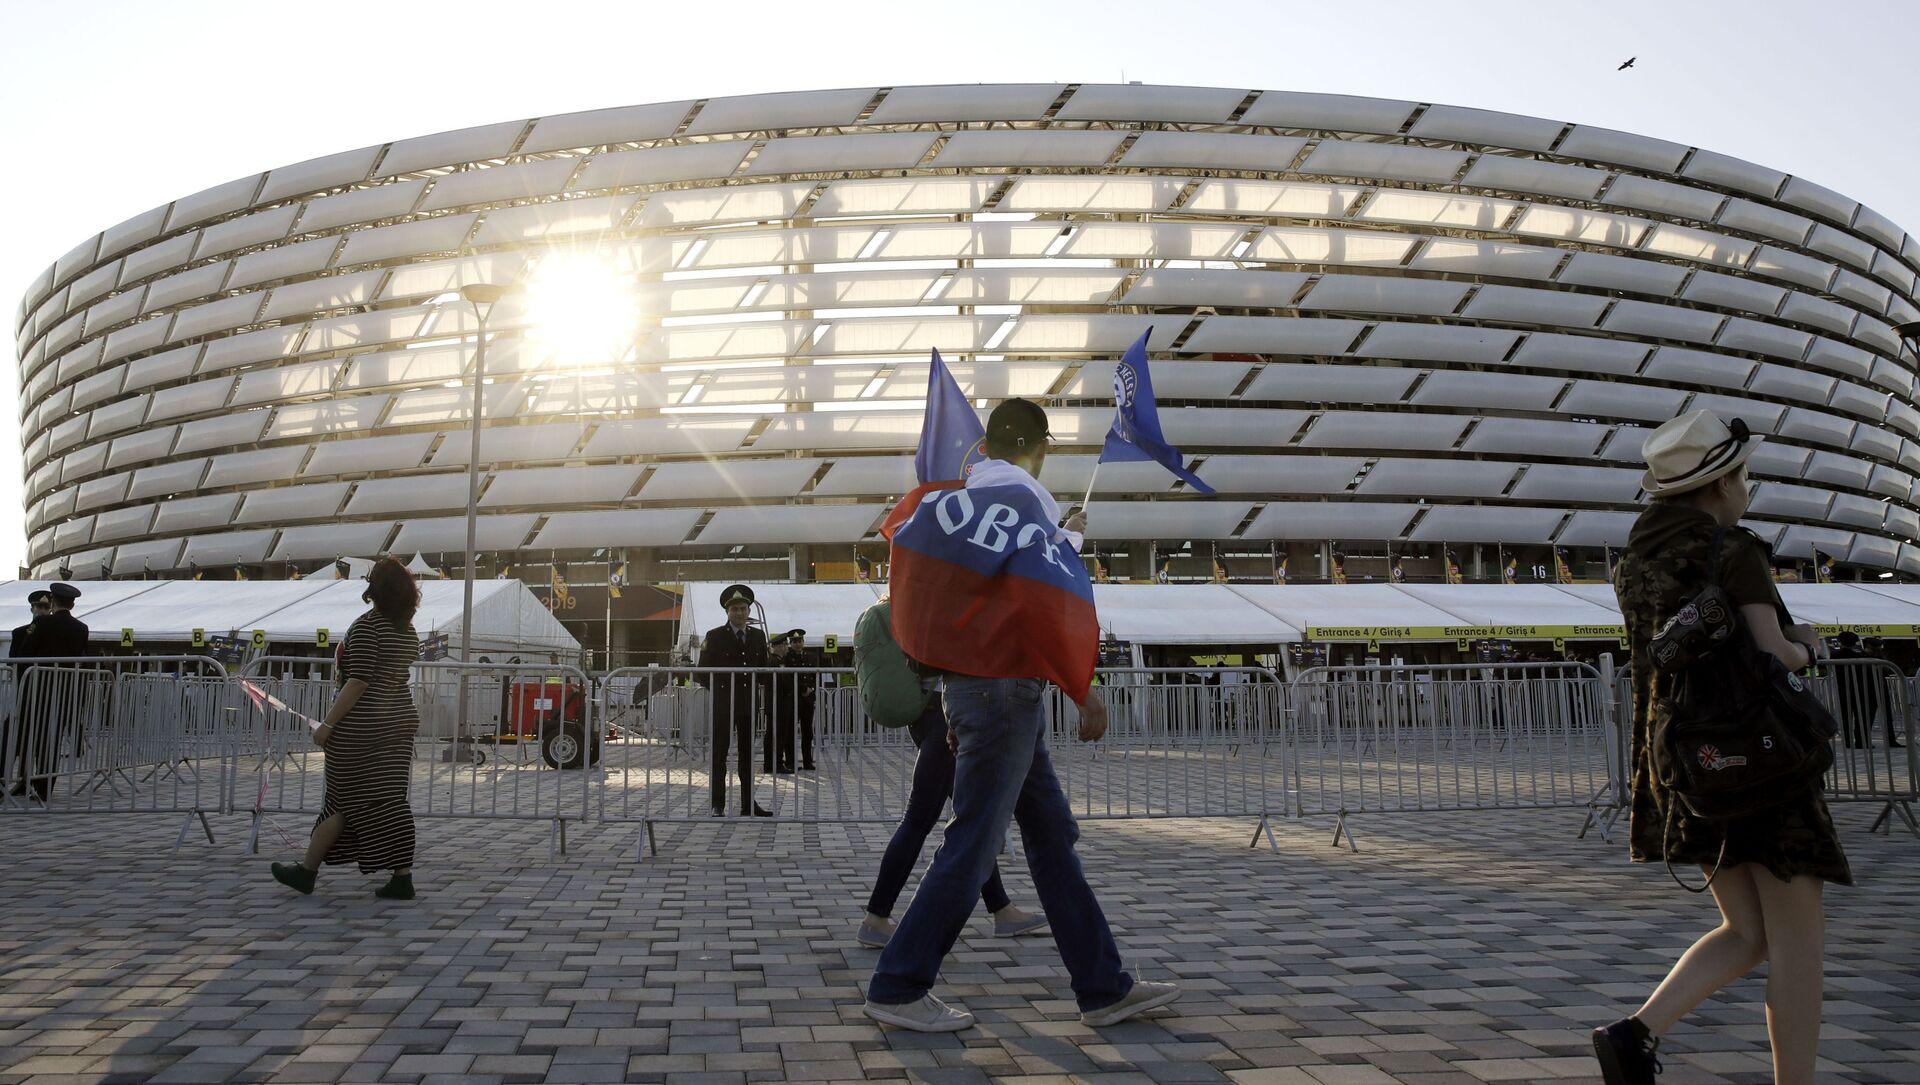 Бакинский олимпийский стадион, фото из архива - Sputnik Азербайджан, 1920, 06.04.2021